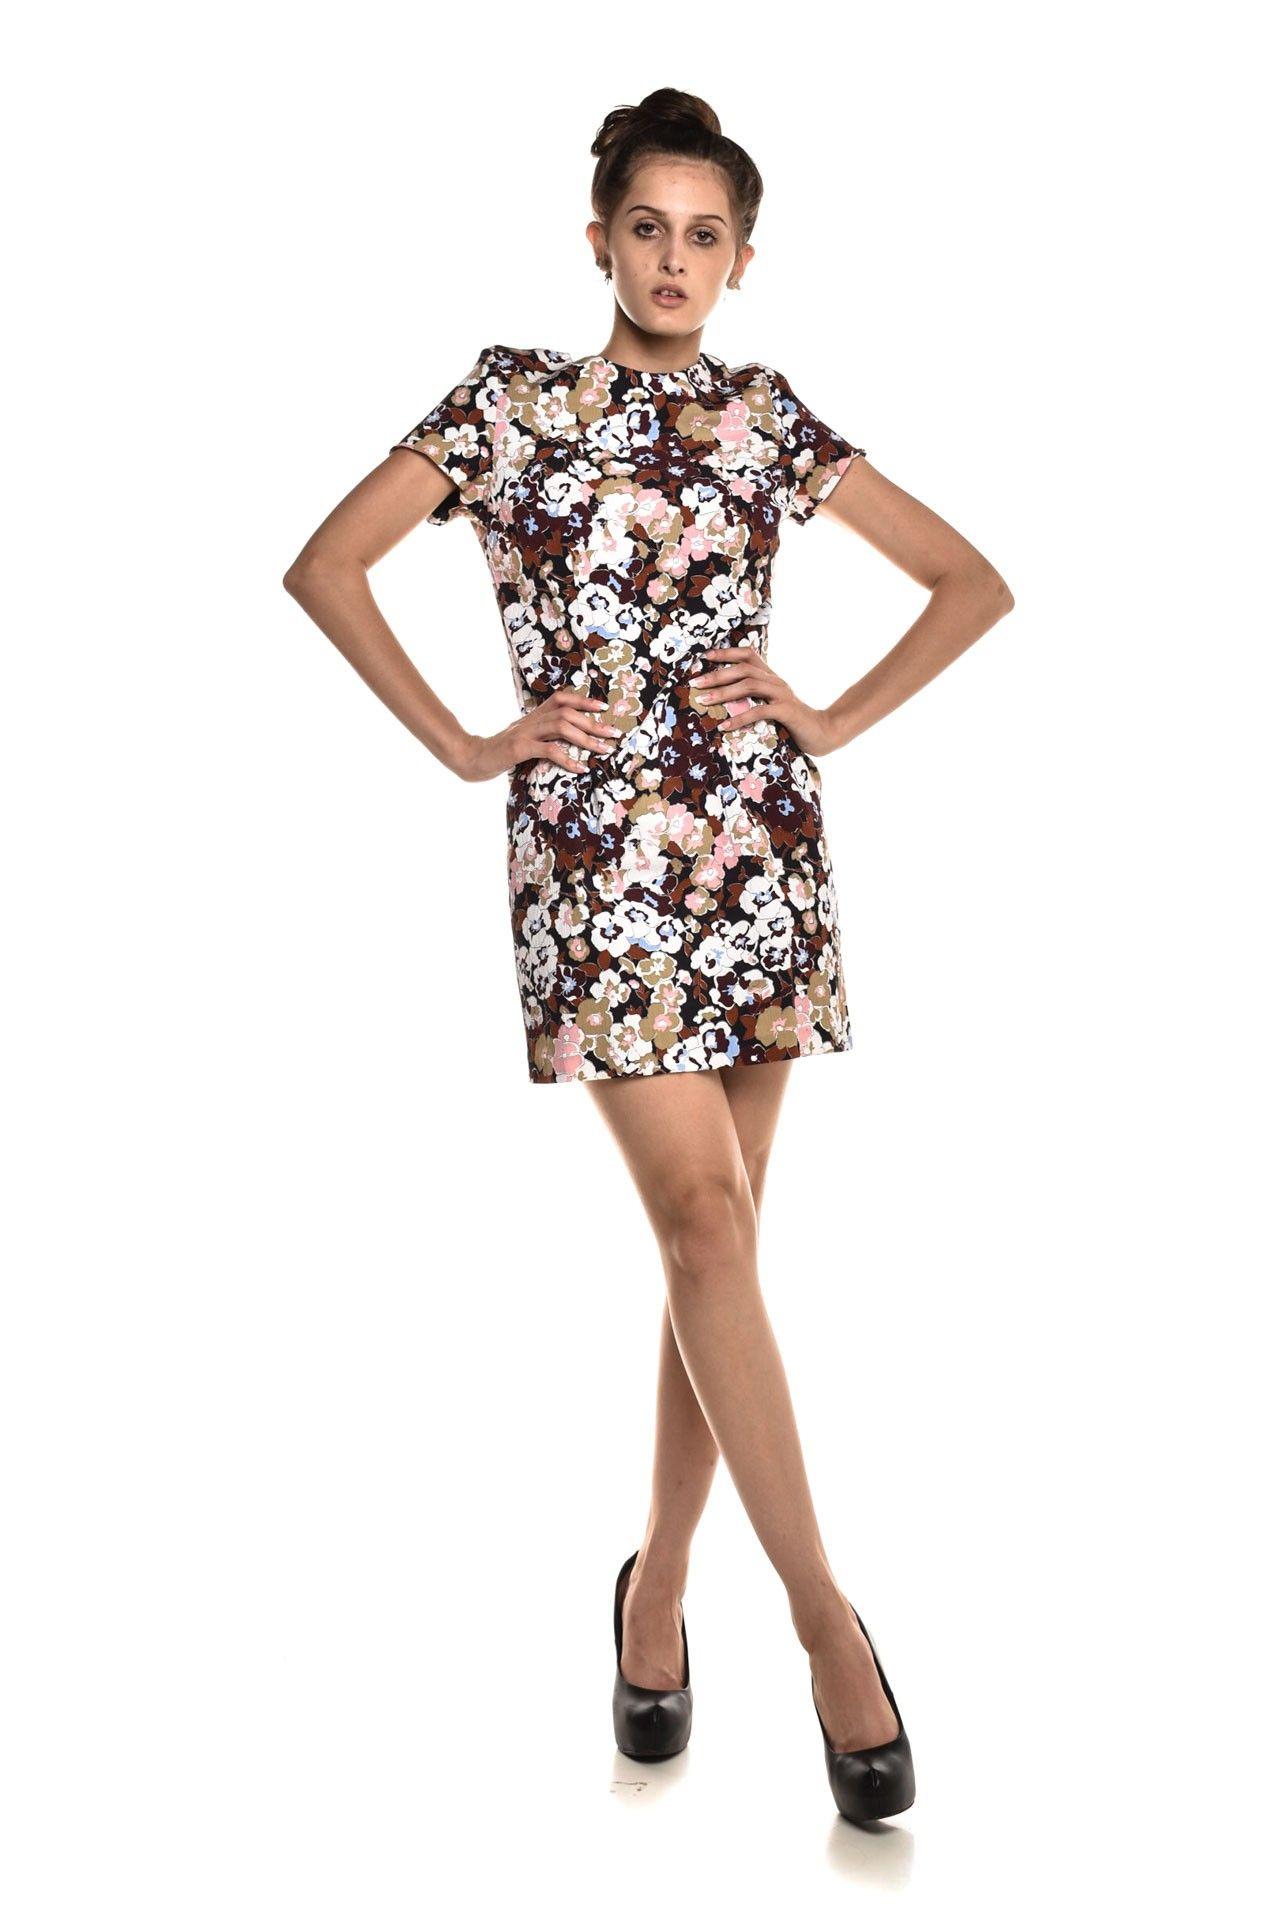 Gant - Vestido Floral Primavera - Foto 2